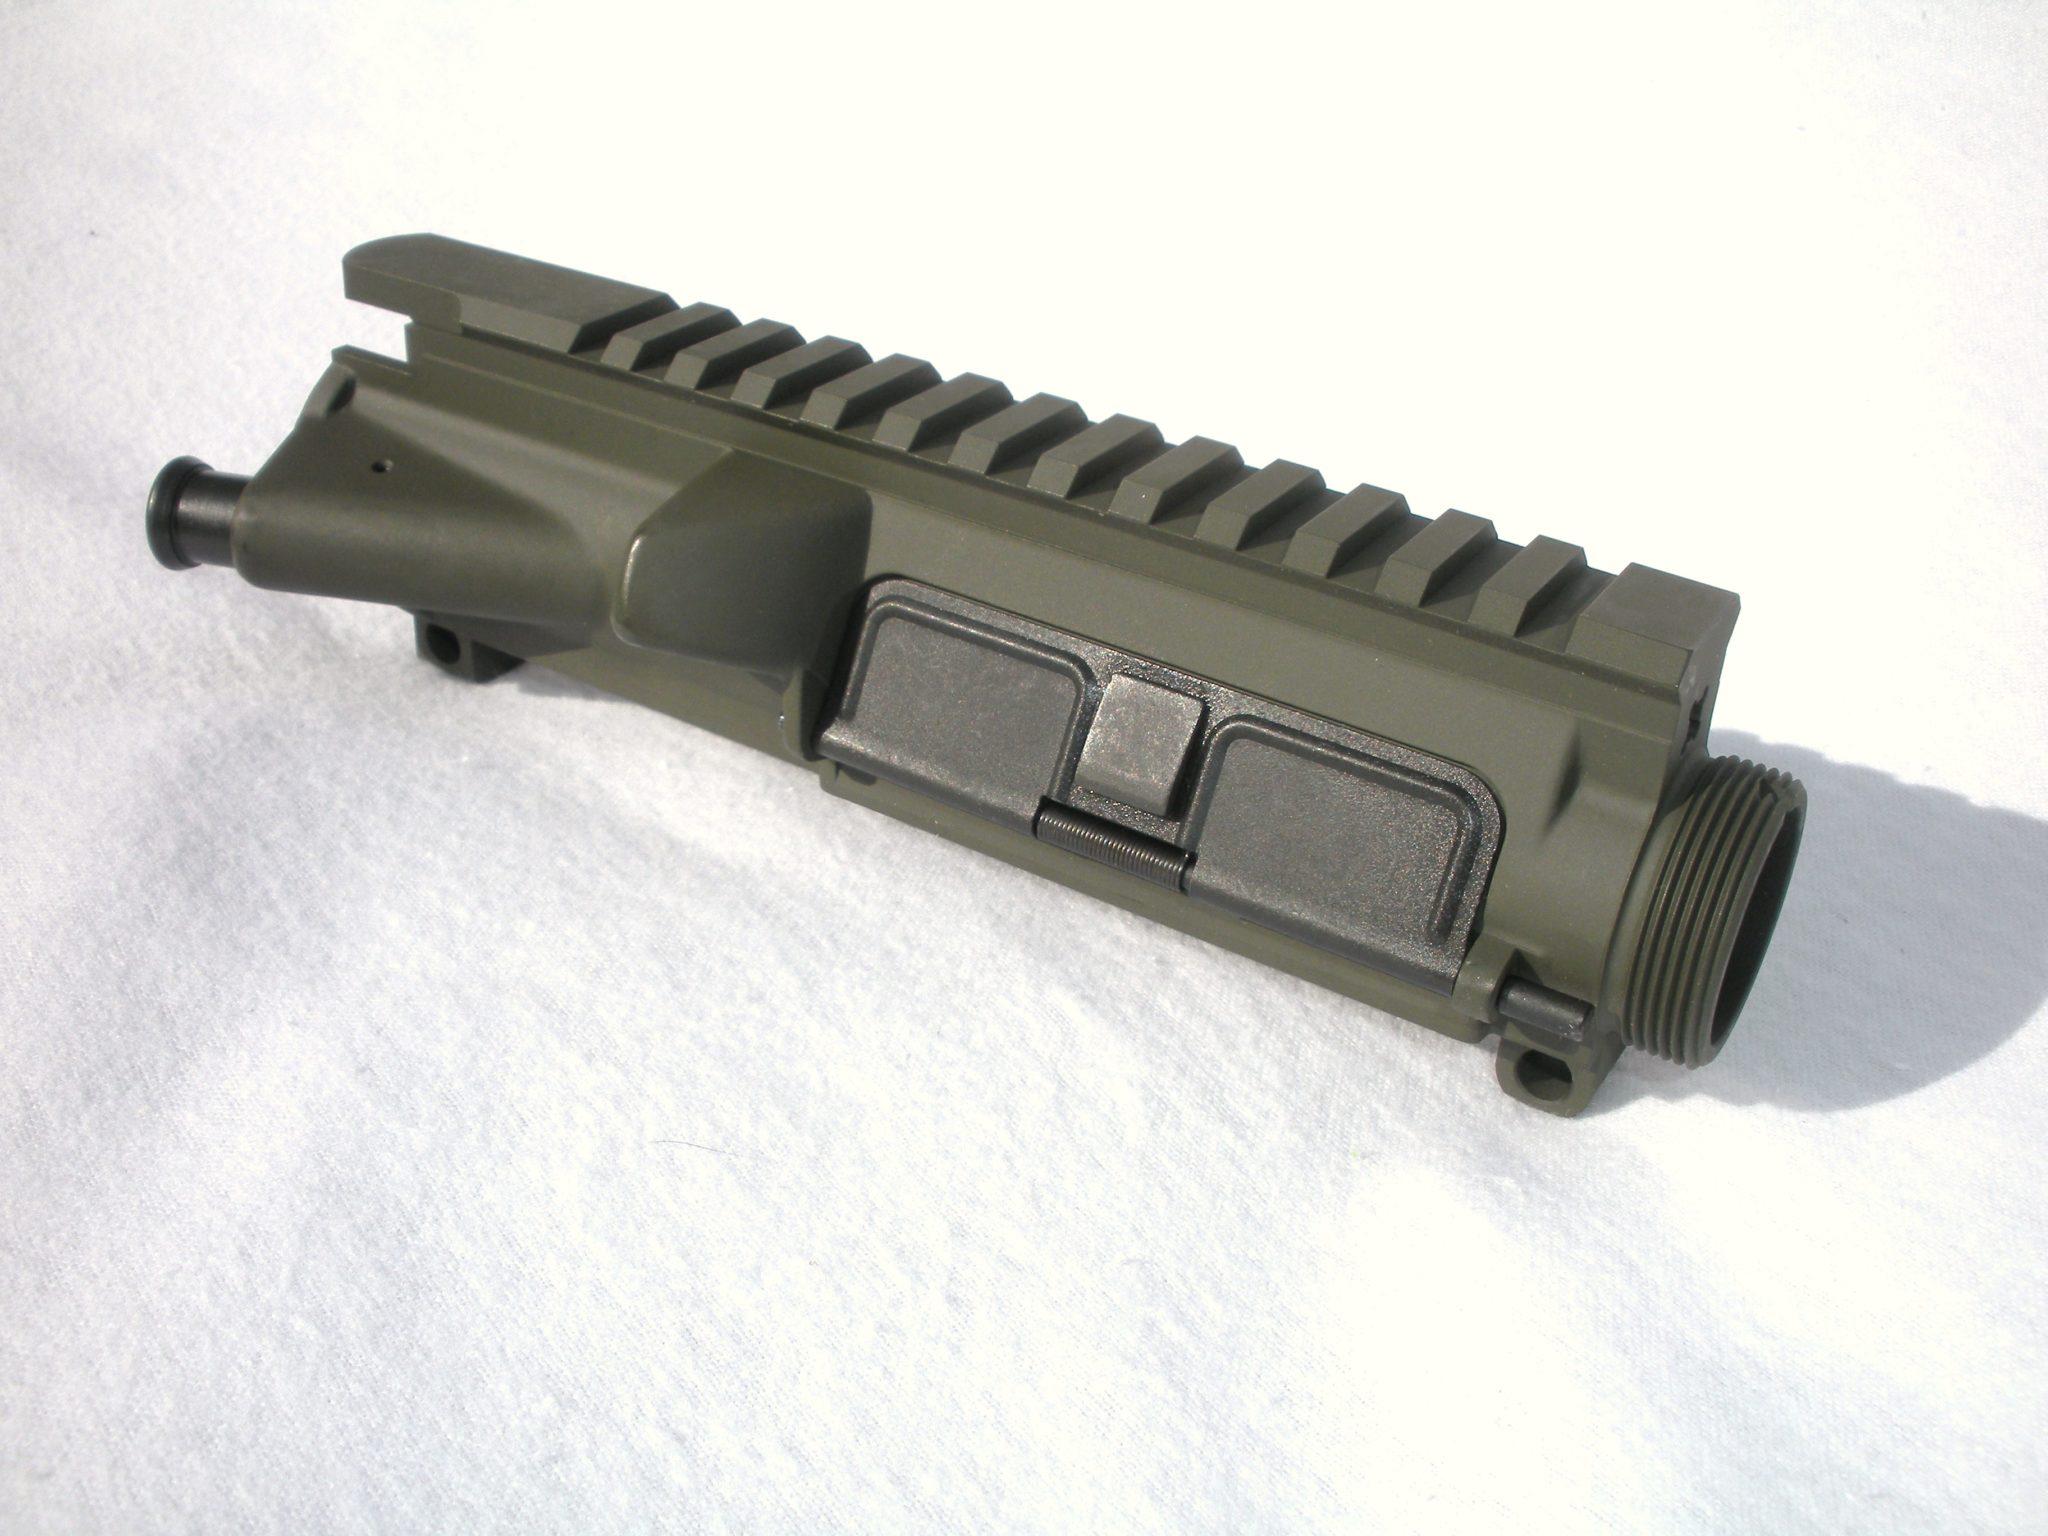 AR15 Upper Receiver - Assembled - O D  Green Cerakote